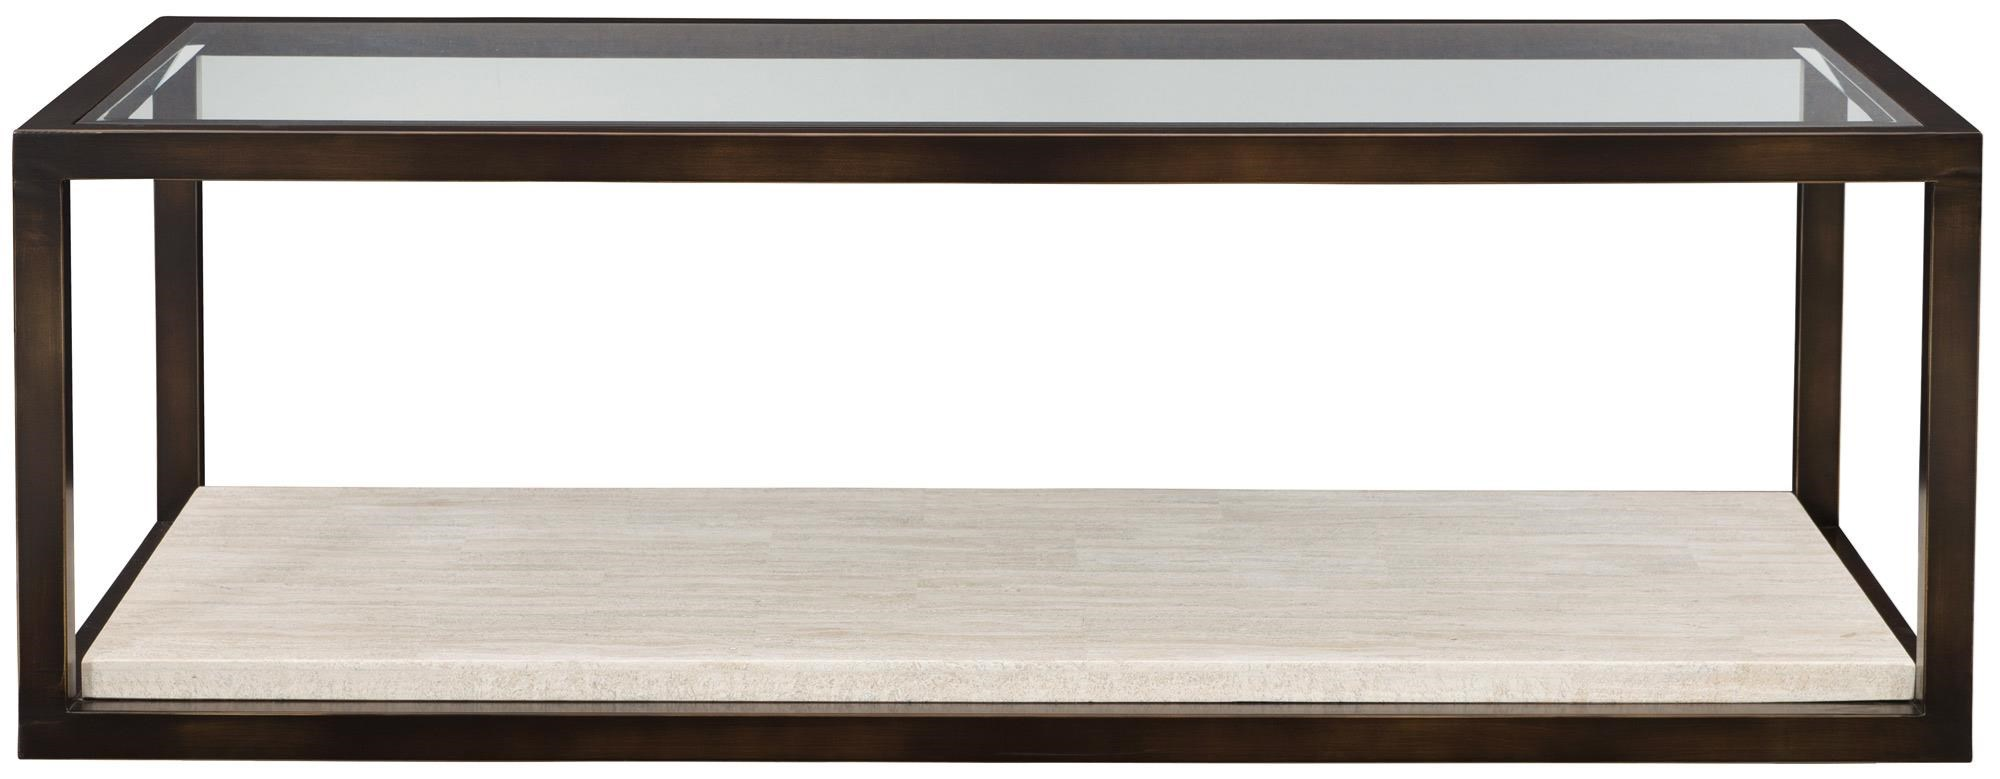 Kinsley Castered Cocktail Table by Bernhardt at Darvin Furniture